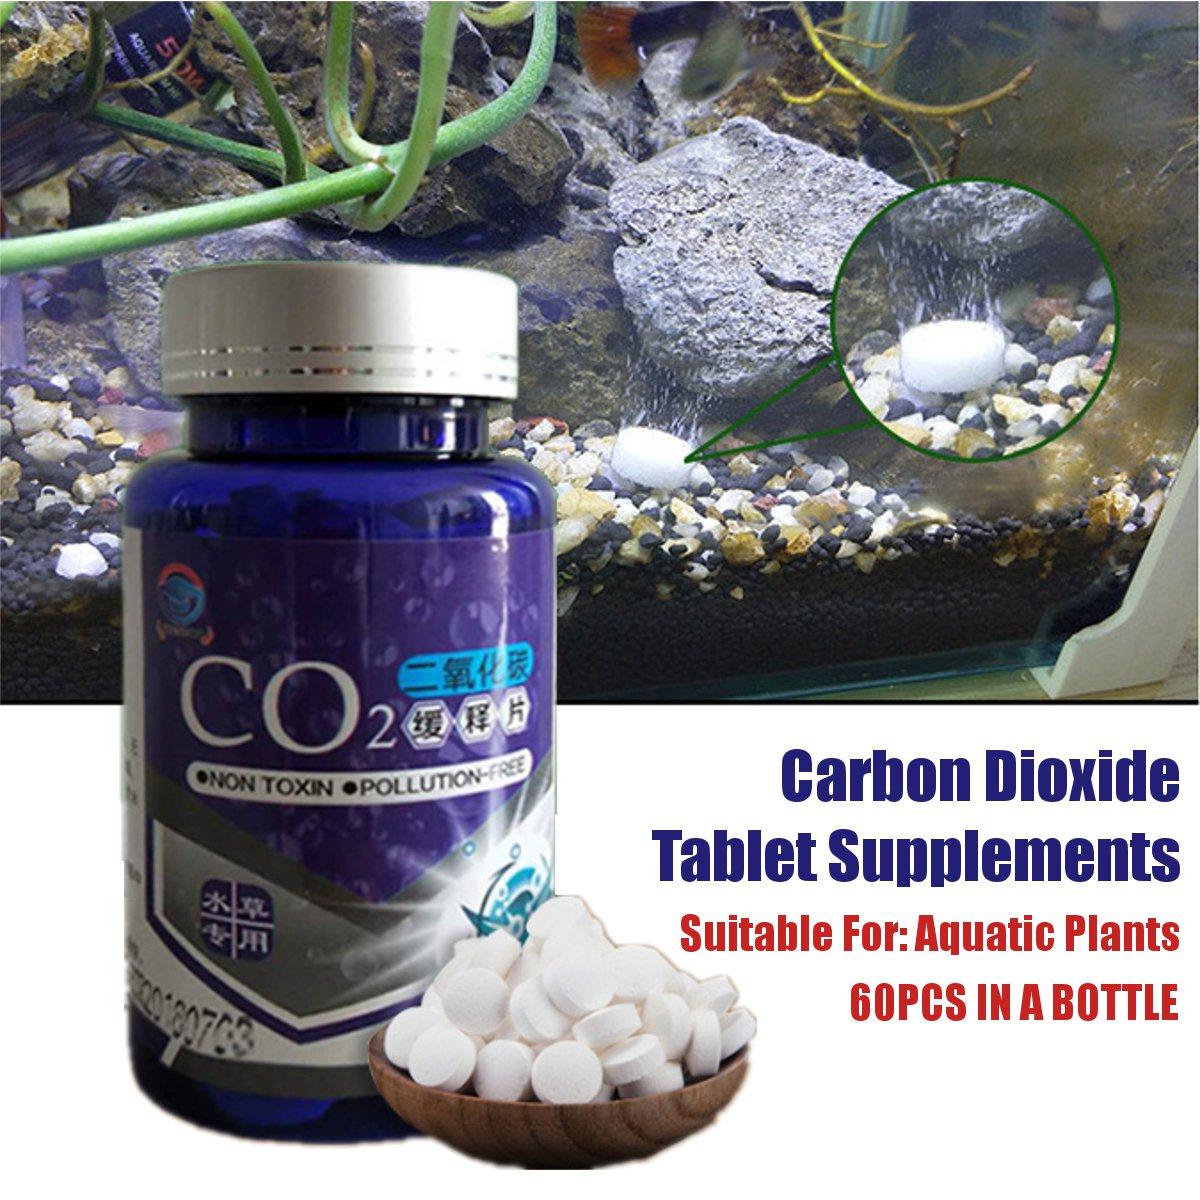 60pcs CO2 Tablet Water Grass Aquarium Plants Aquatic Leaf Float Grass CO2 Carbon Dioxide Slice Diffuser Producer For Fish Tank